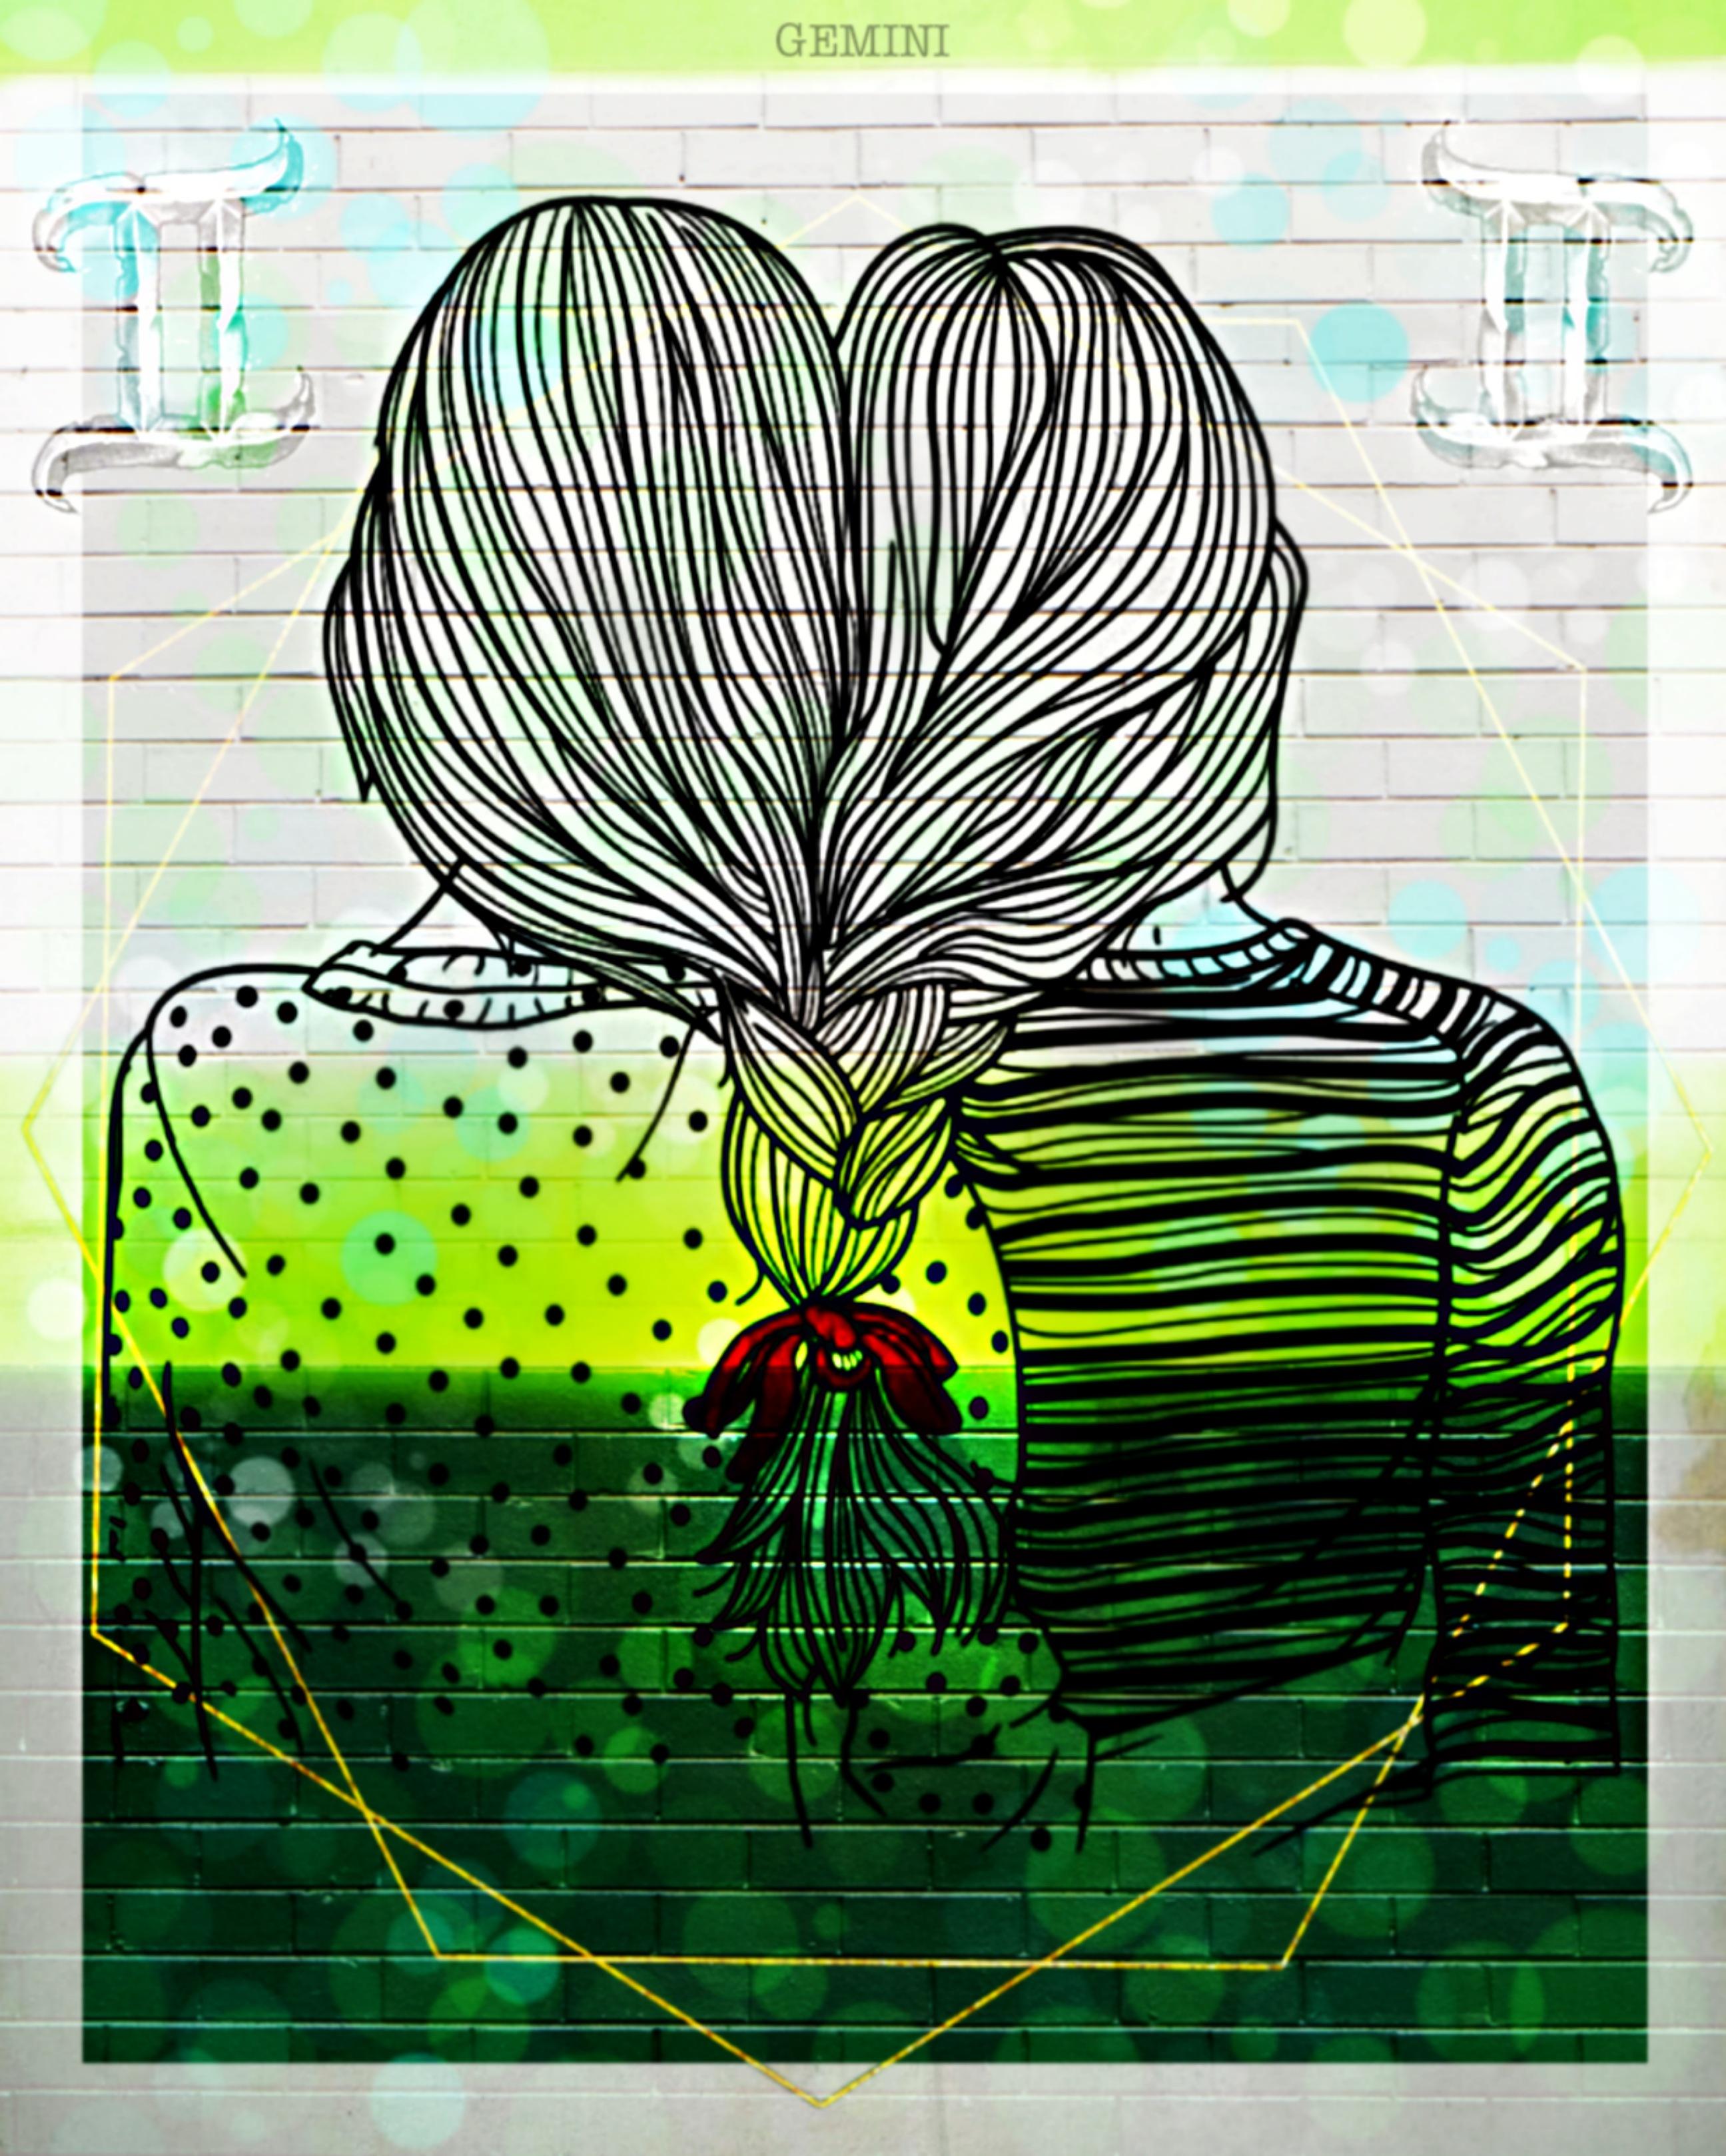 #gemini #zodiac #tarot #nc86 #girls #twins #green #symmetrical